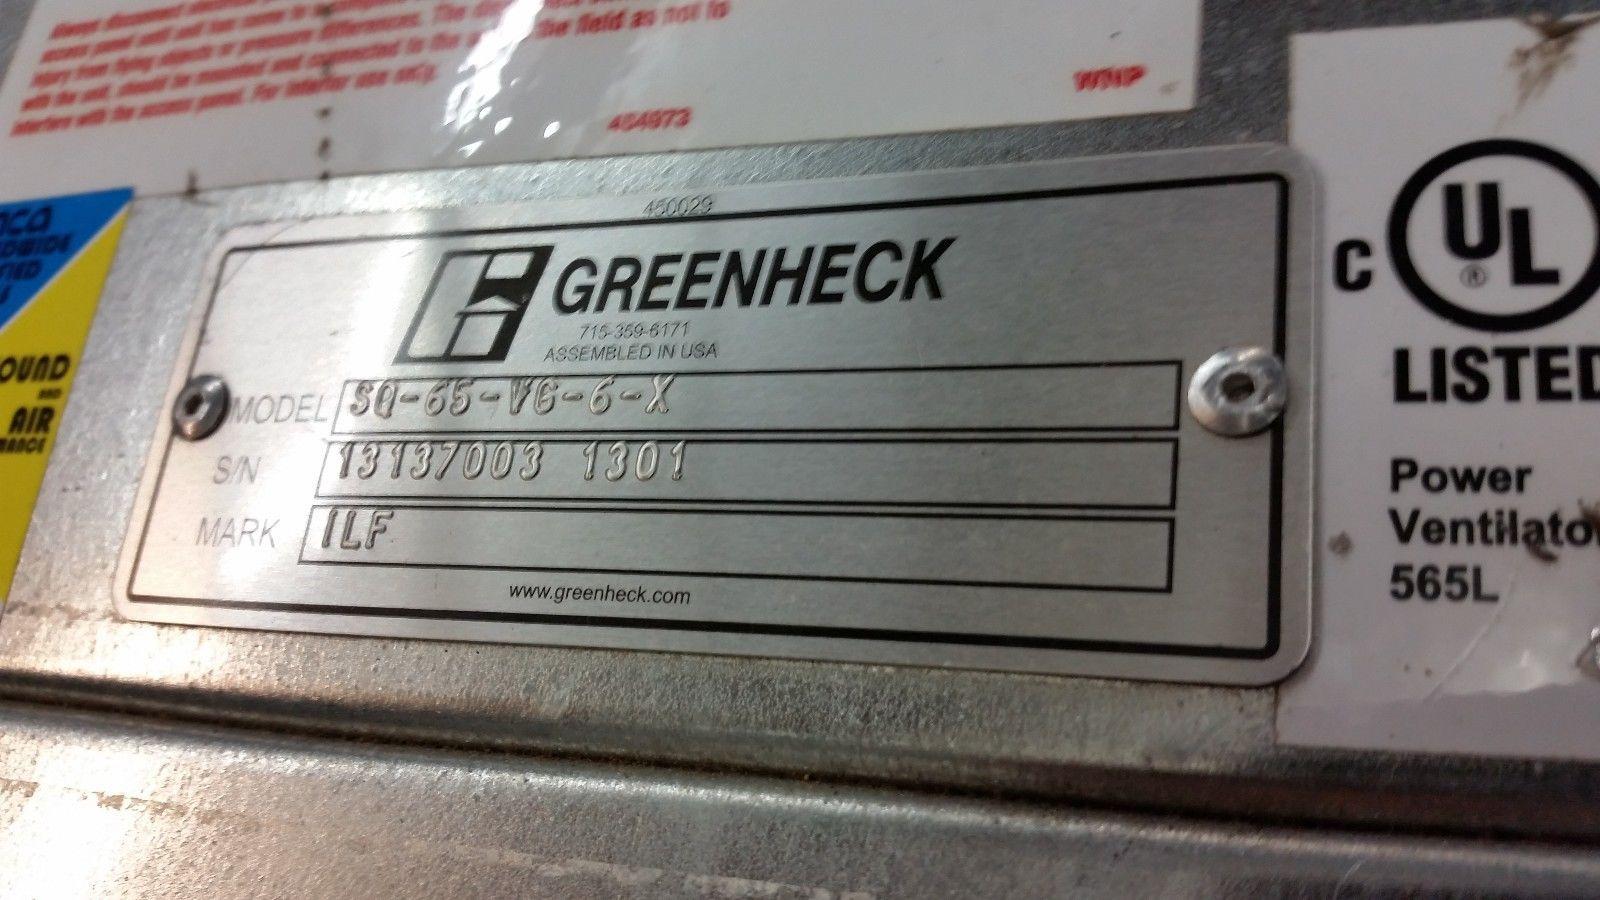 "GREENHECK  SQ-65-VG-6-X INLINE 9"" DUCT BOOSTER FAN 115V 1/6HP"